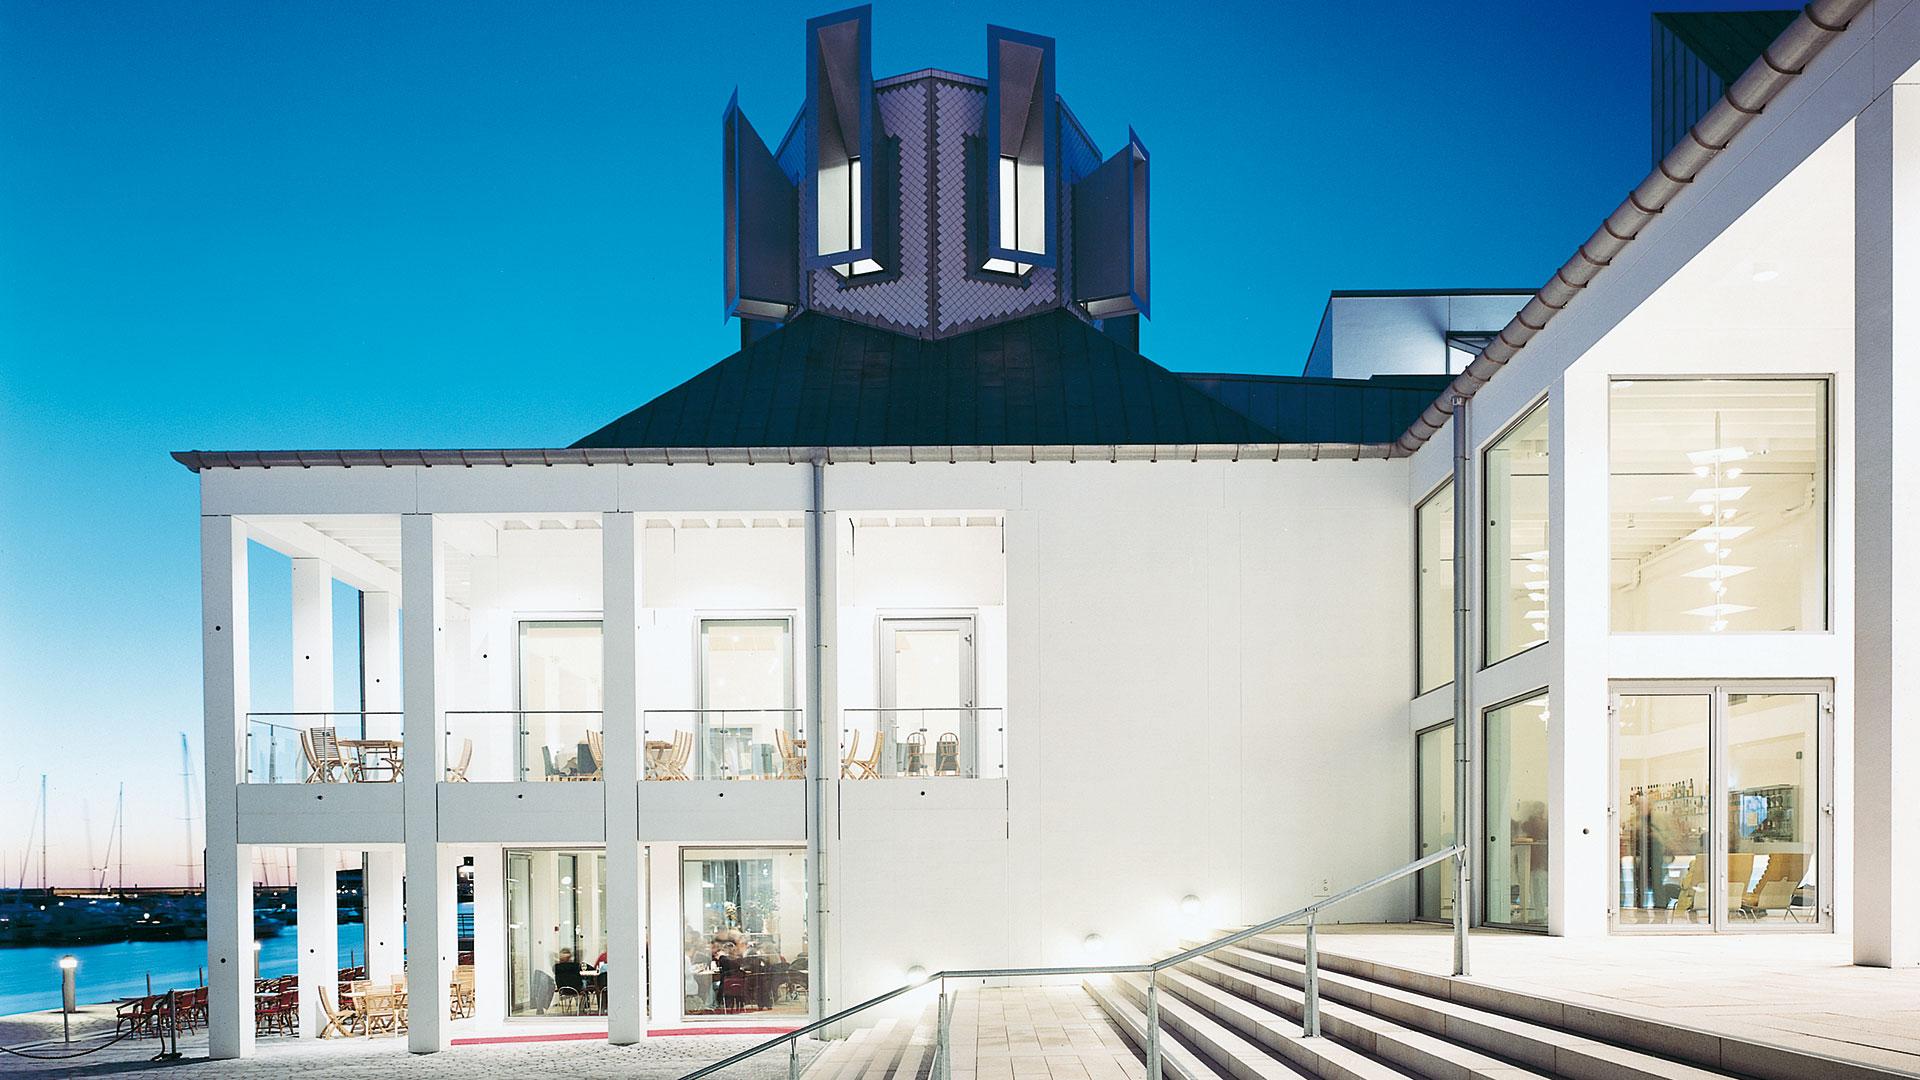 Dunkers kulturhus